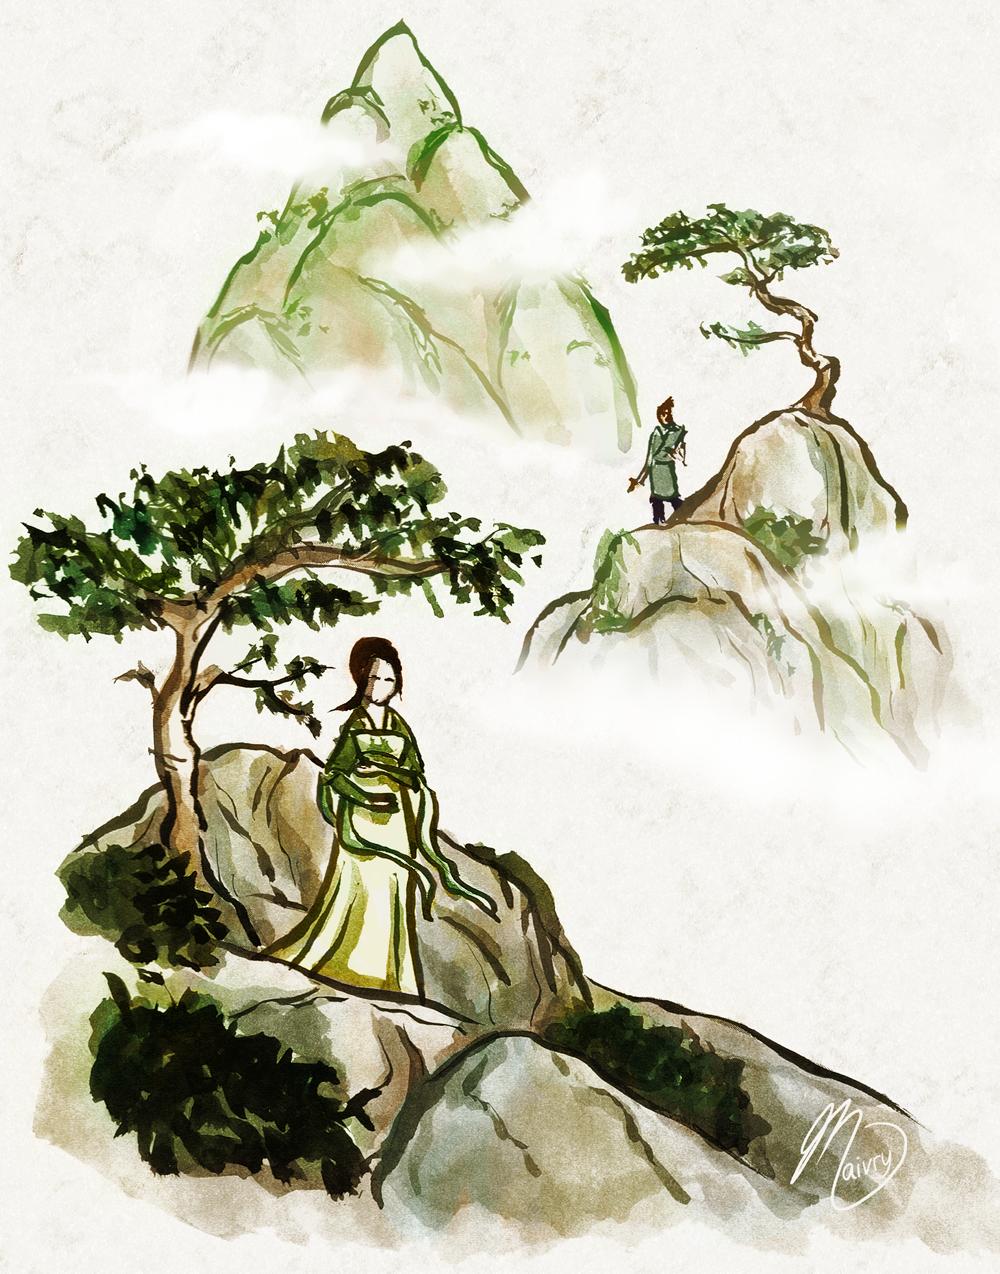 Tokka Month 2012: Legend by Maivry